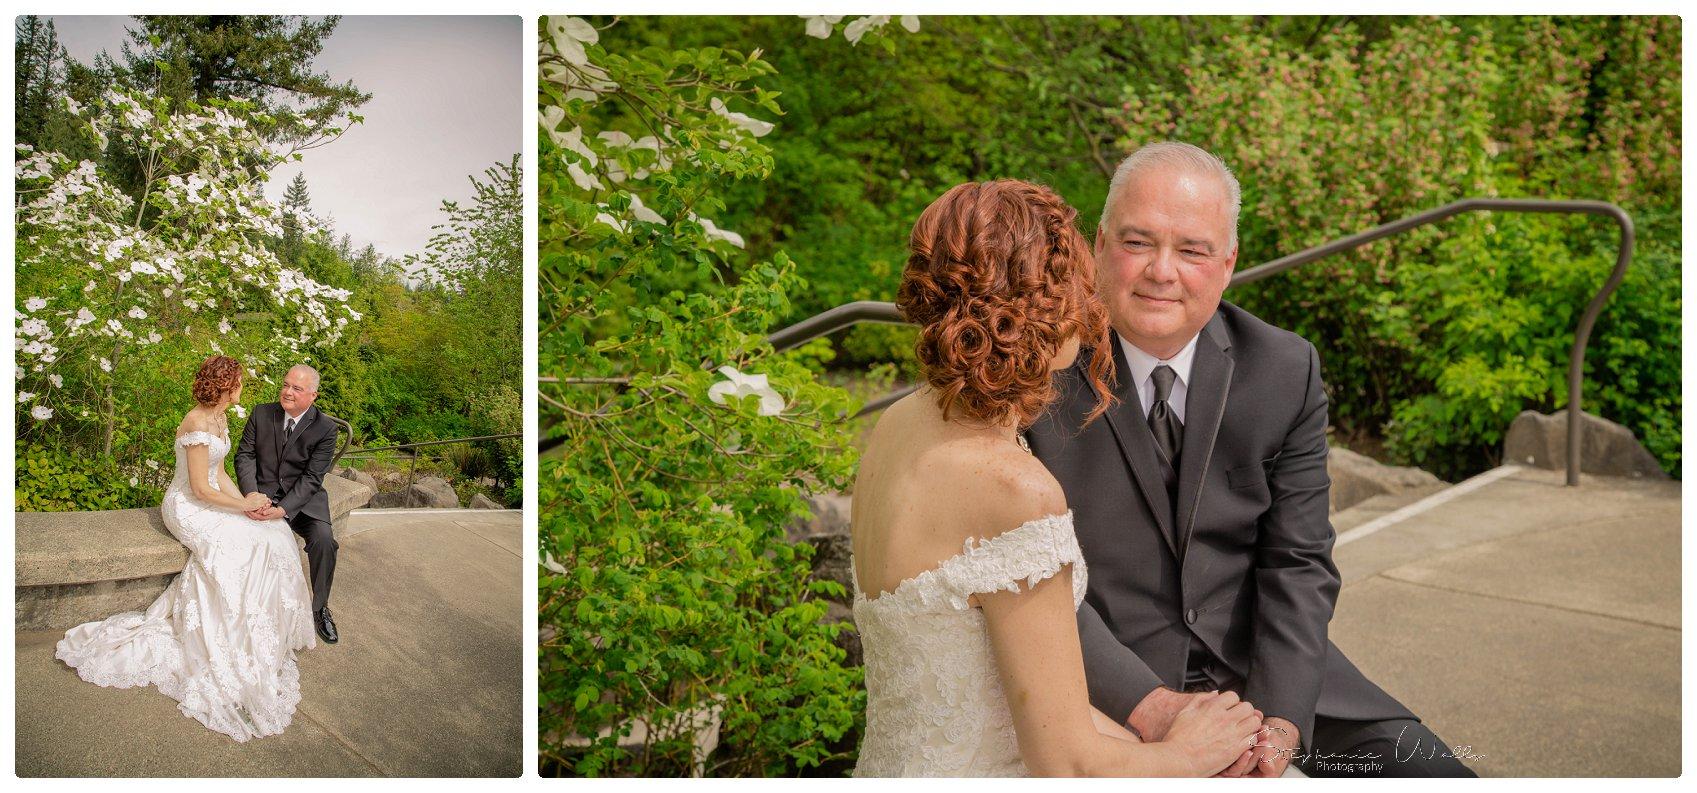 Portraits Ceremony 018 Salish Lodge & Spa    Elopement With Liz and Paul